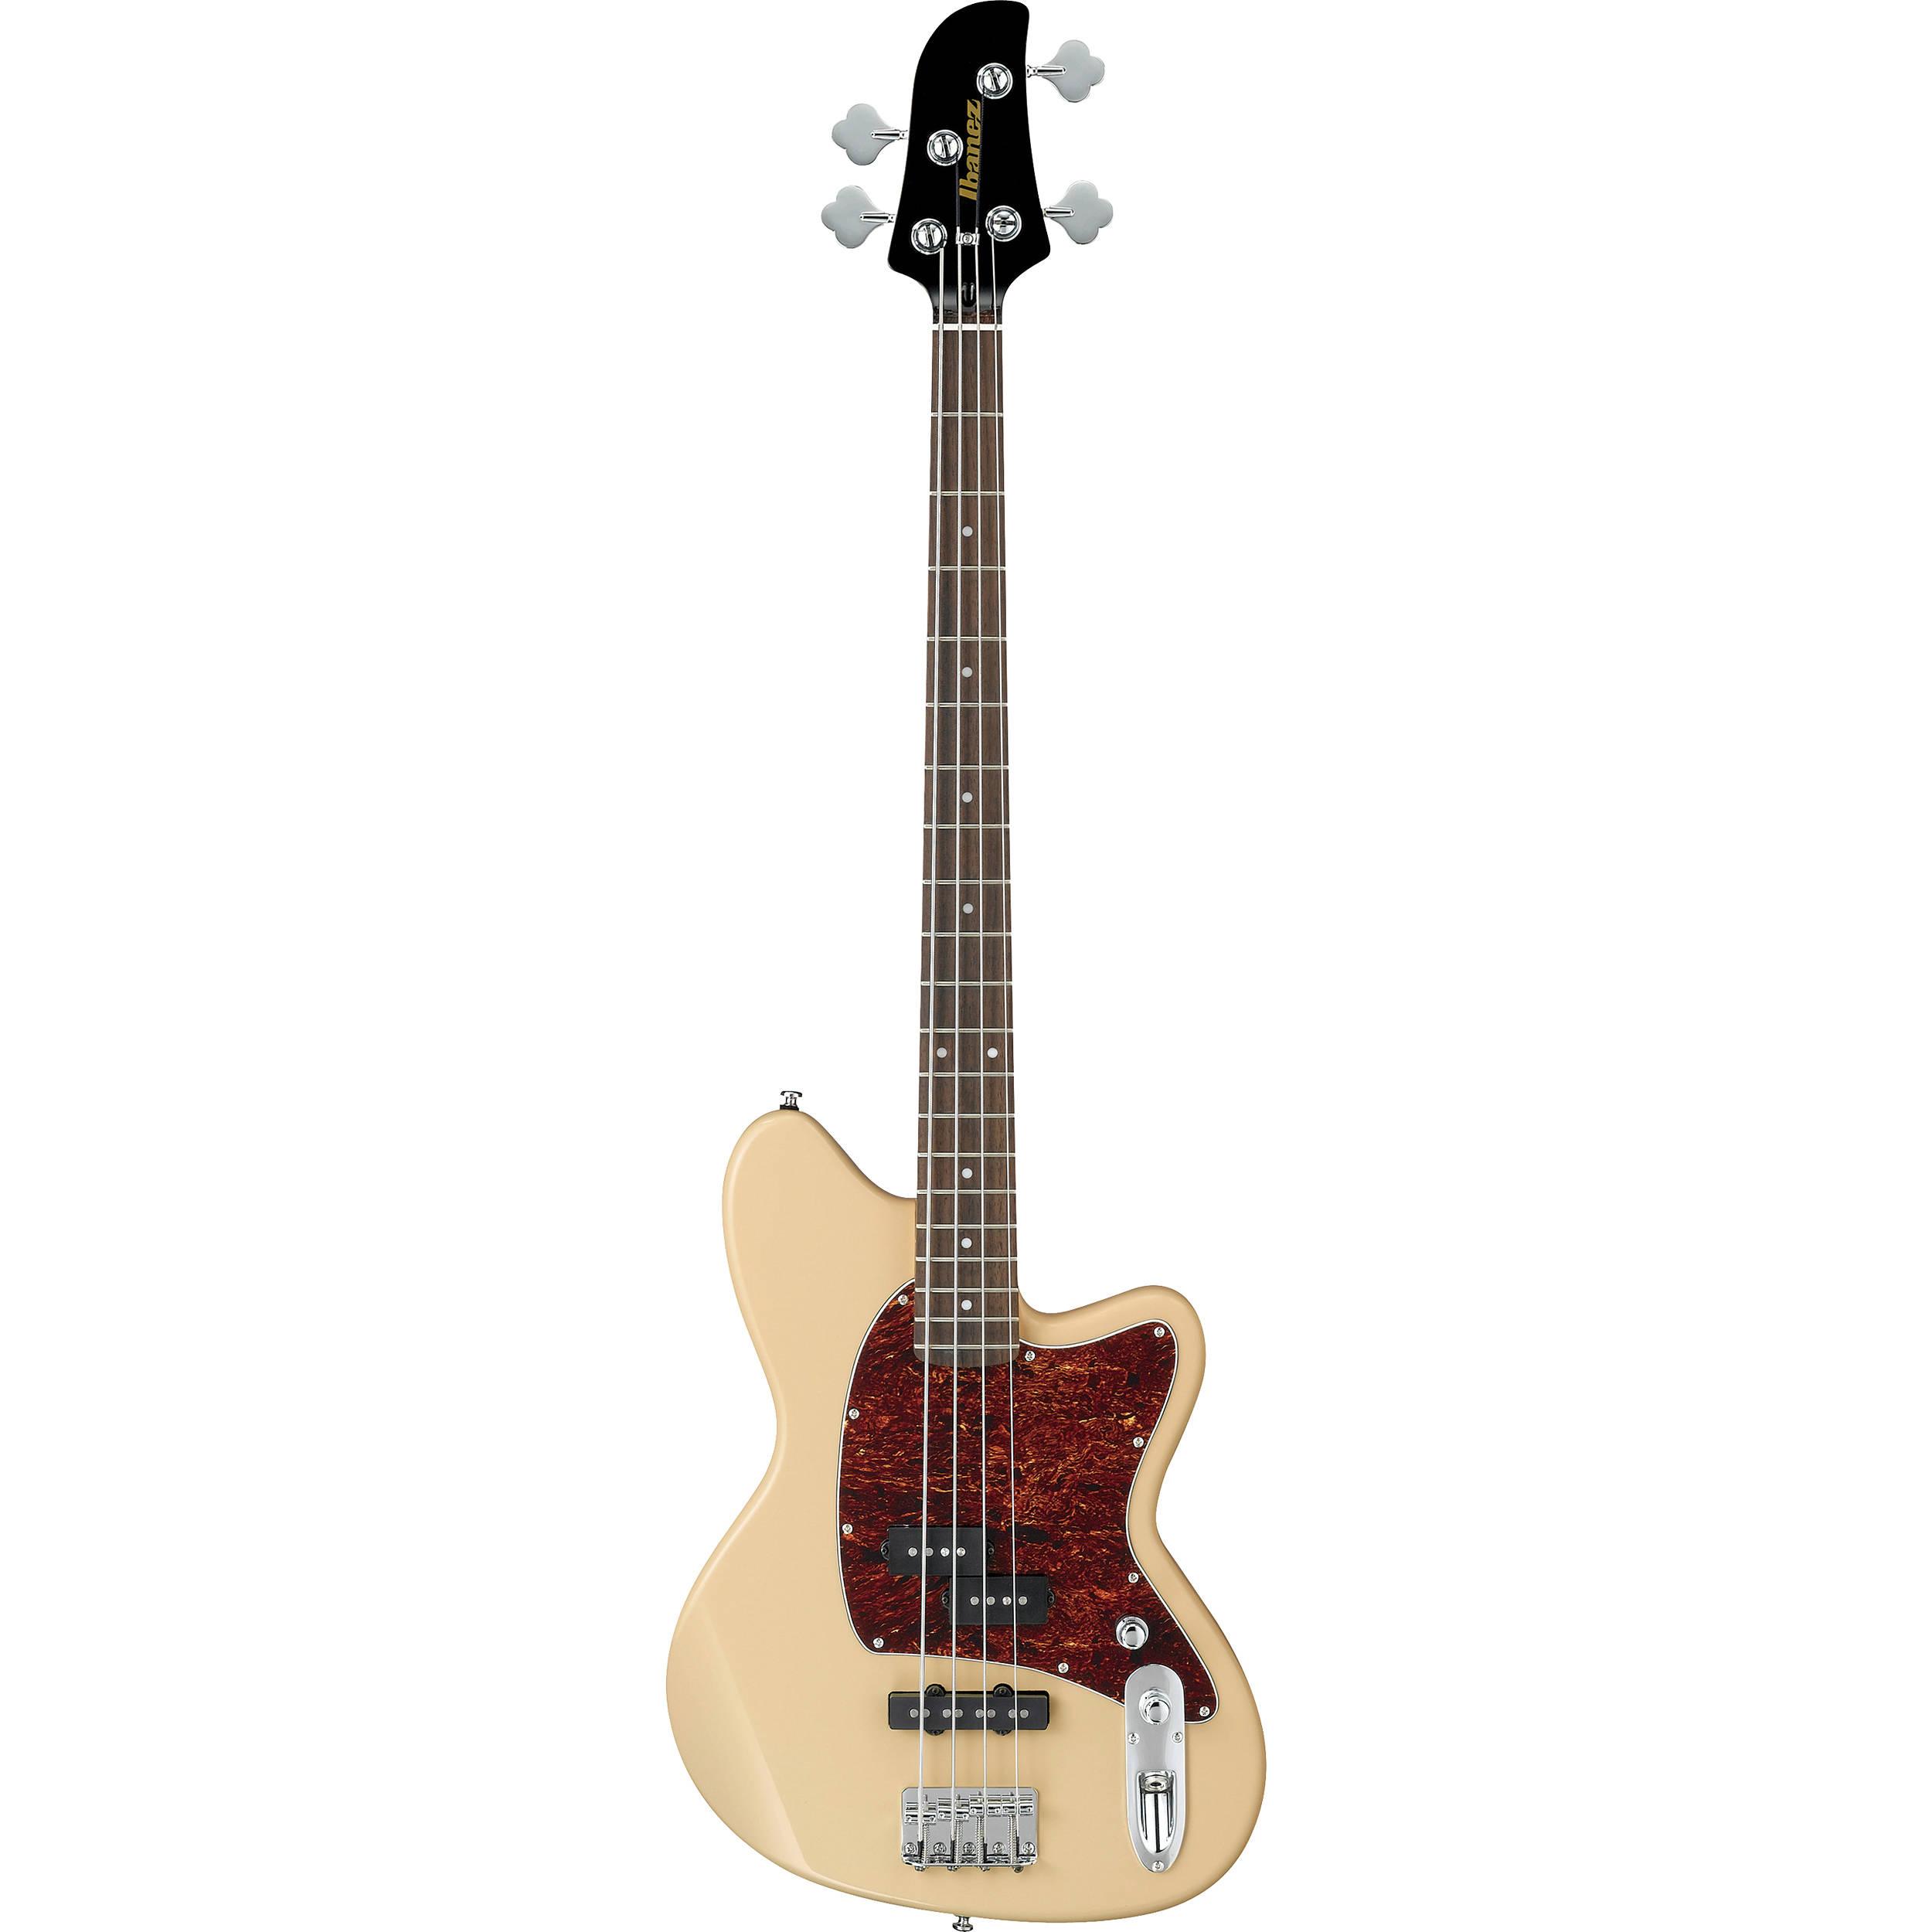 Ibanez Talman Bass Standard Series